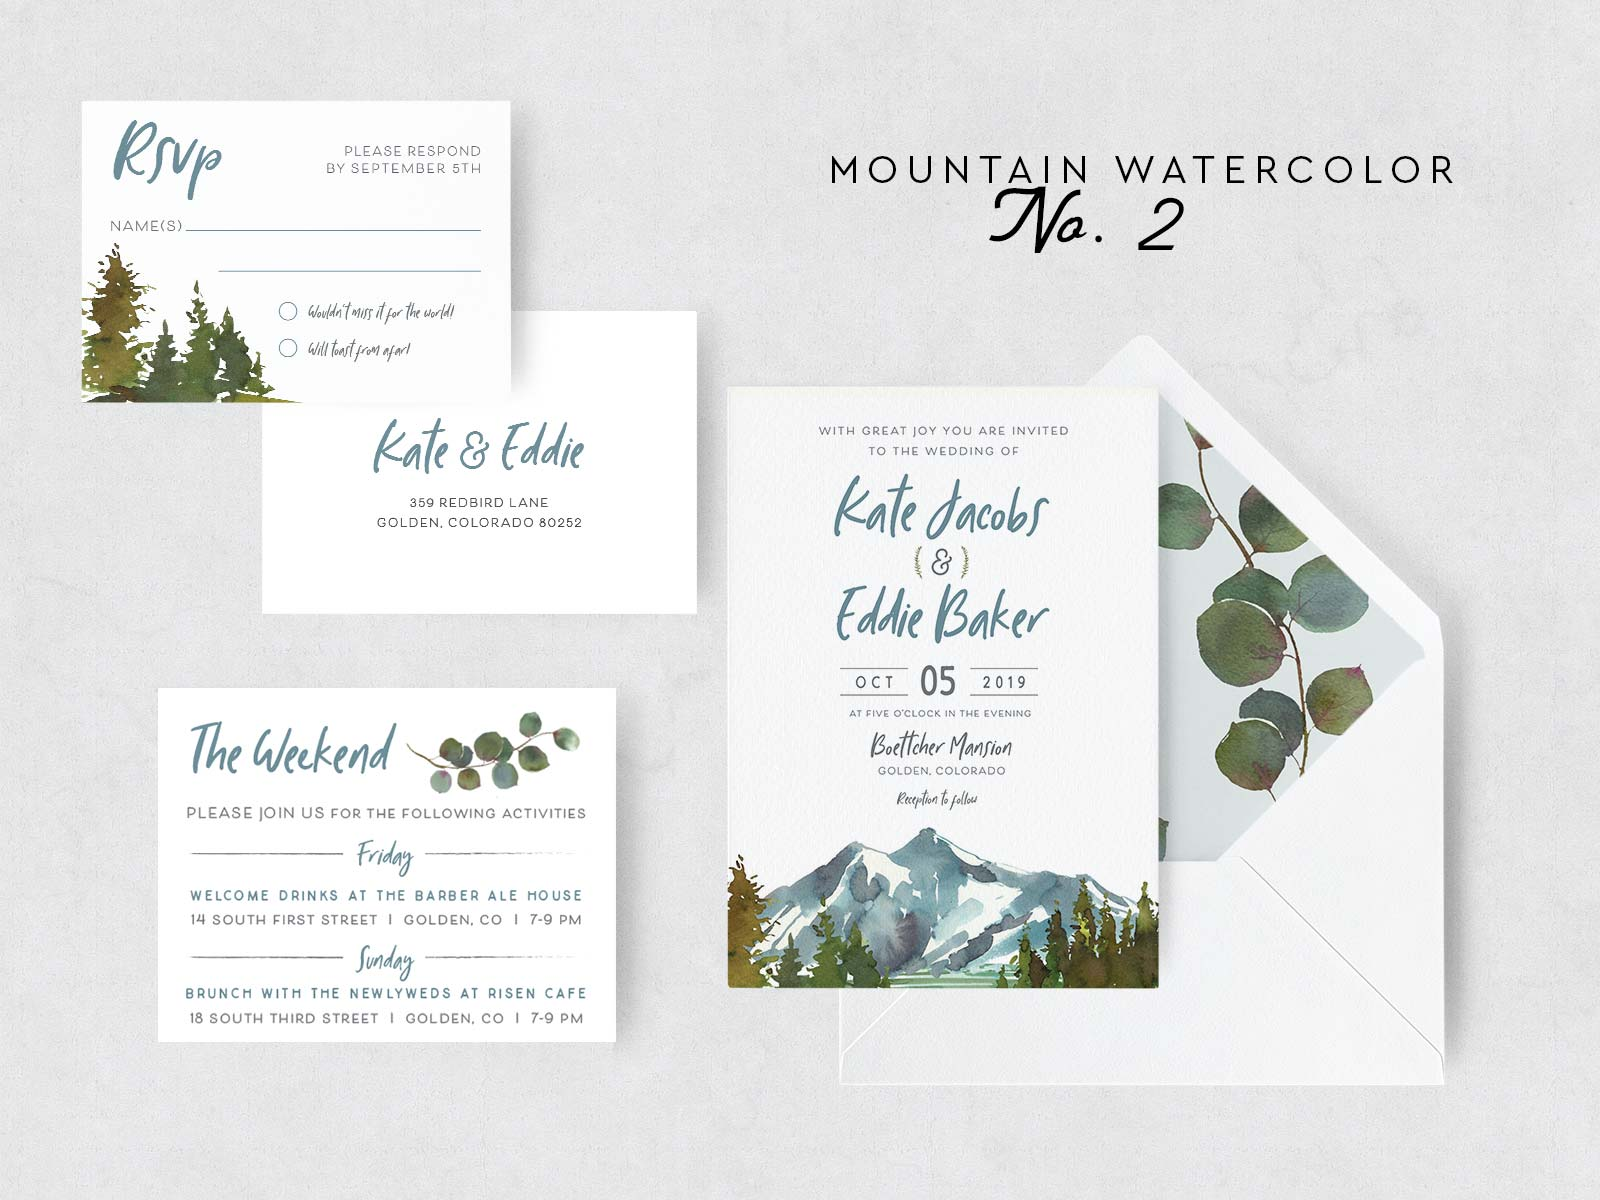 Mountain-Watercolor-2.jpg